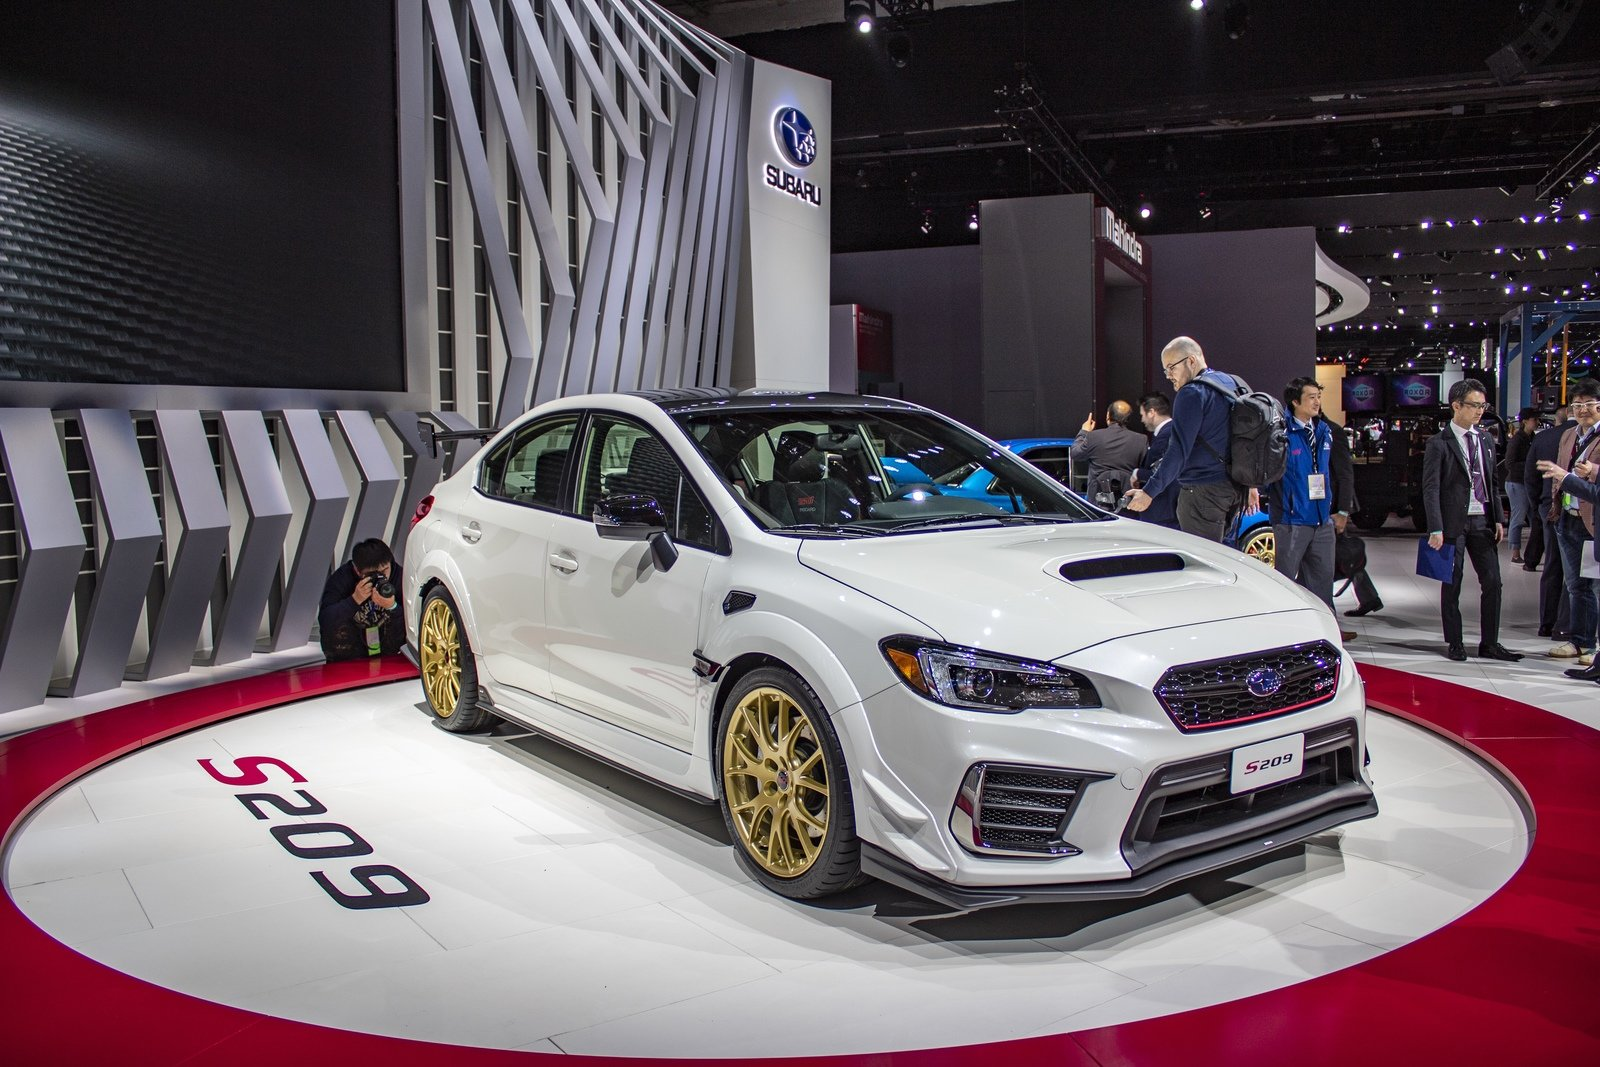 Subaru Impreza Wrx Sti Rally Car Wallpaper 2019 Subaru Wrx Sti S209 Pictures Photos Wallpapers